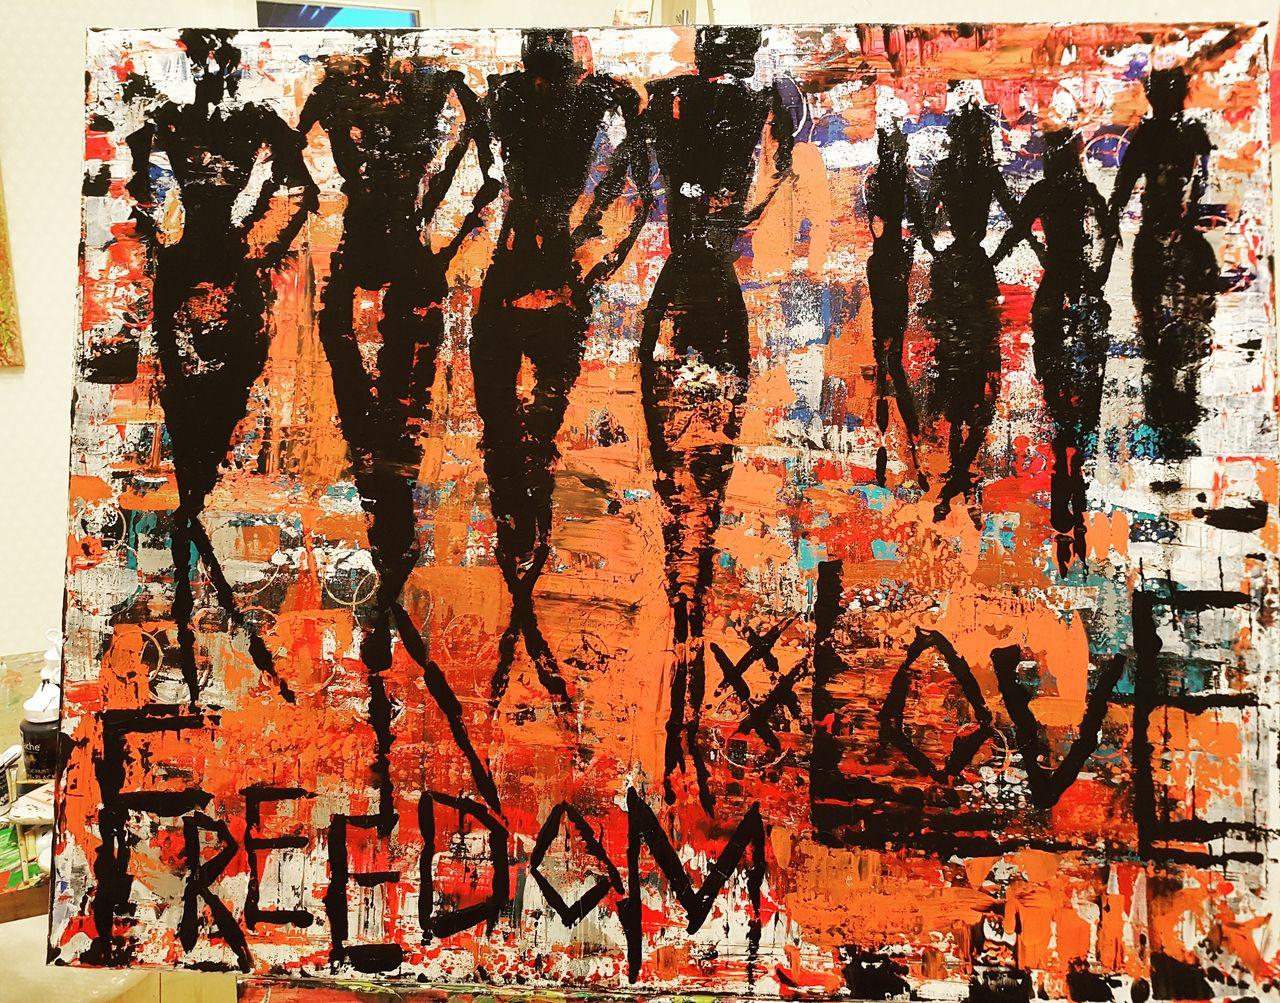 Art by Eva-Lotta Olsson Love your freedom